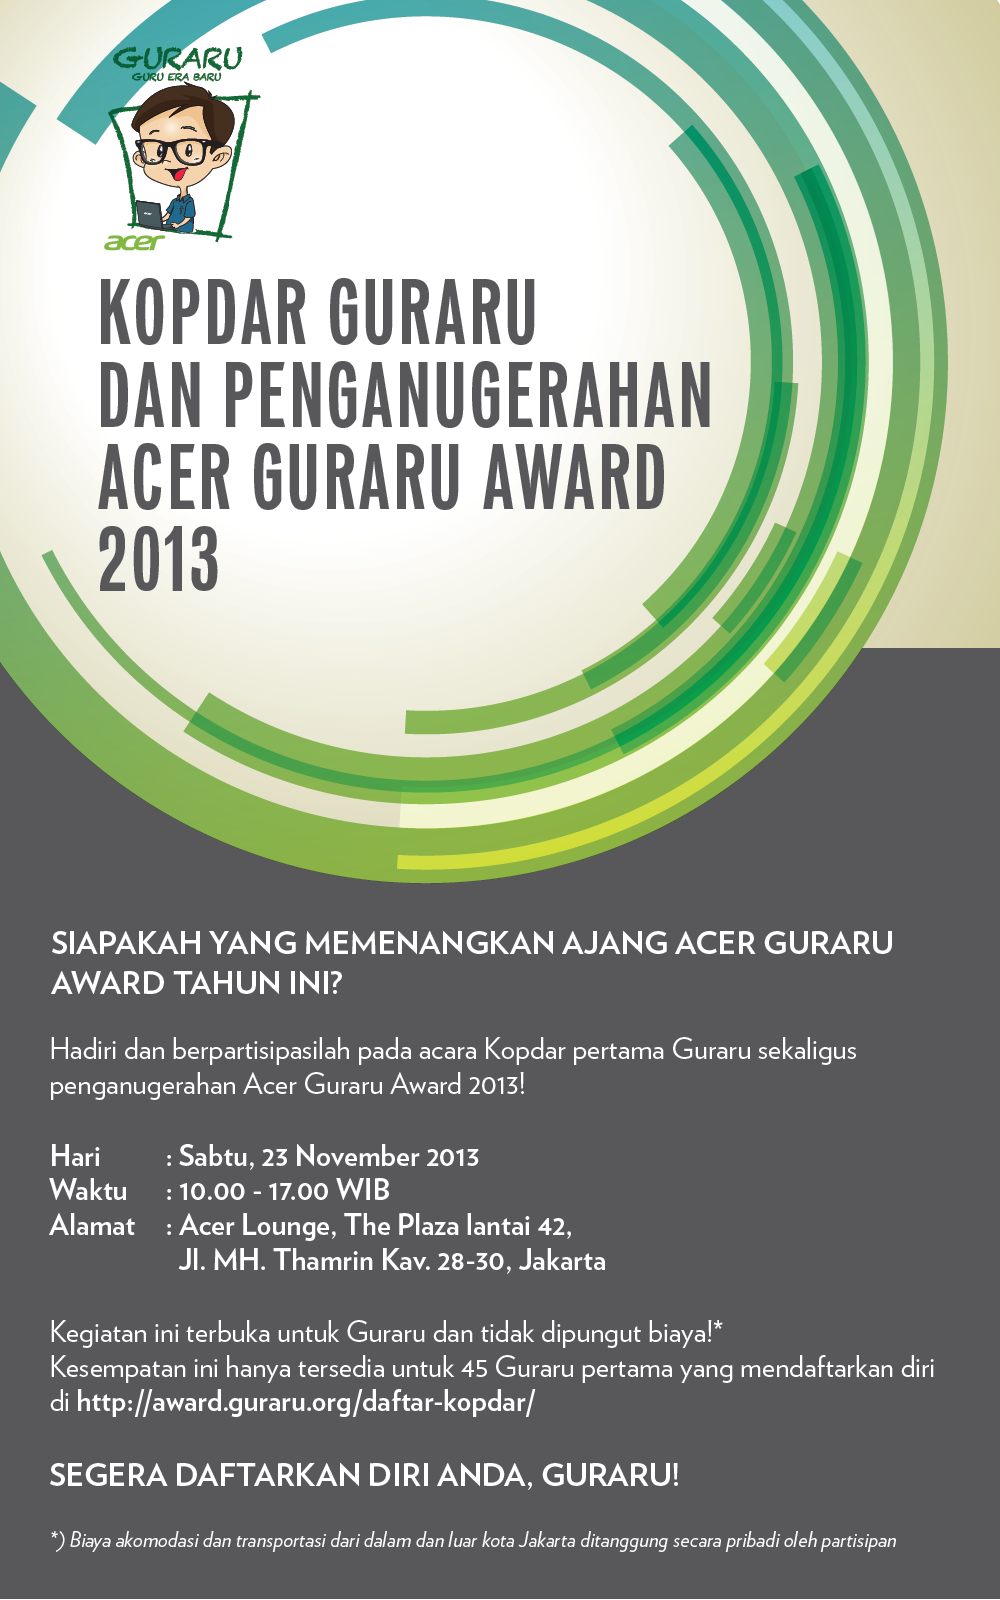 acer guraru award 2013